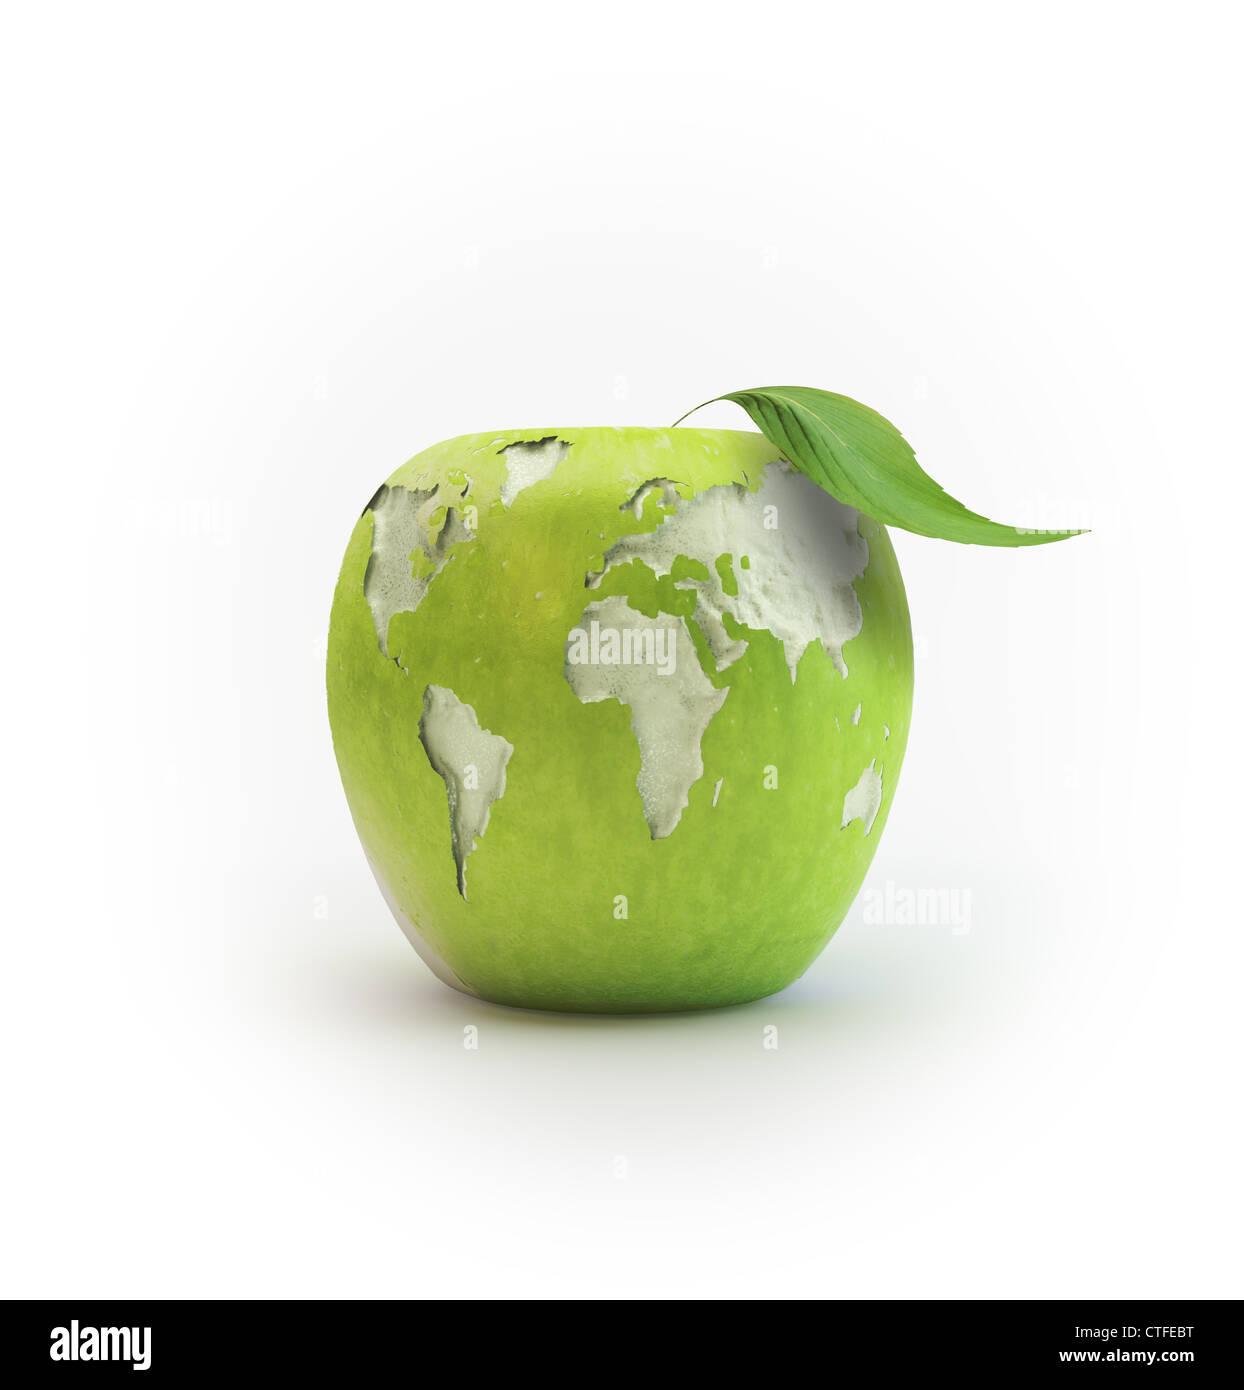 Geschälten Apfel bildet die Weltkarte Stockfoto